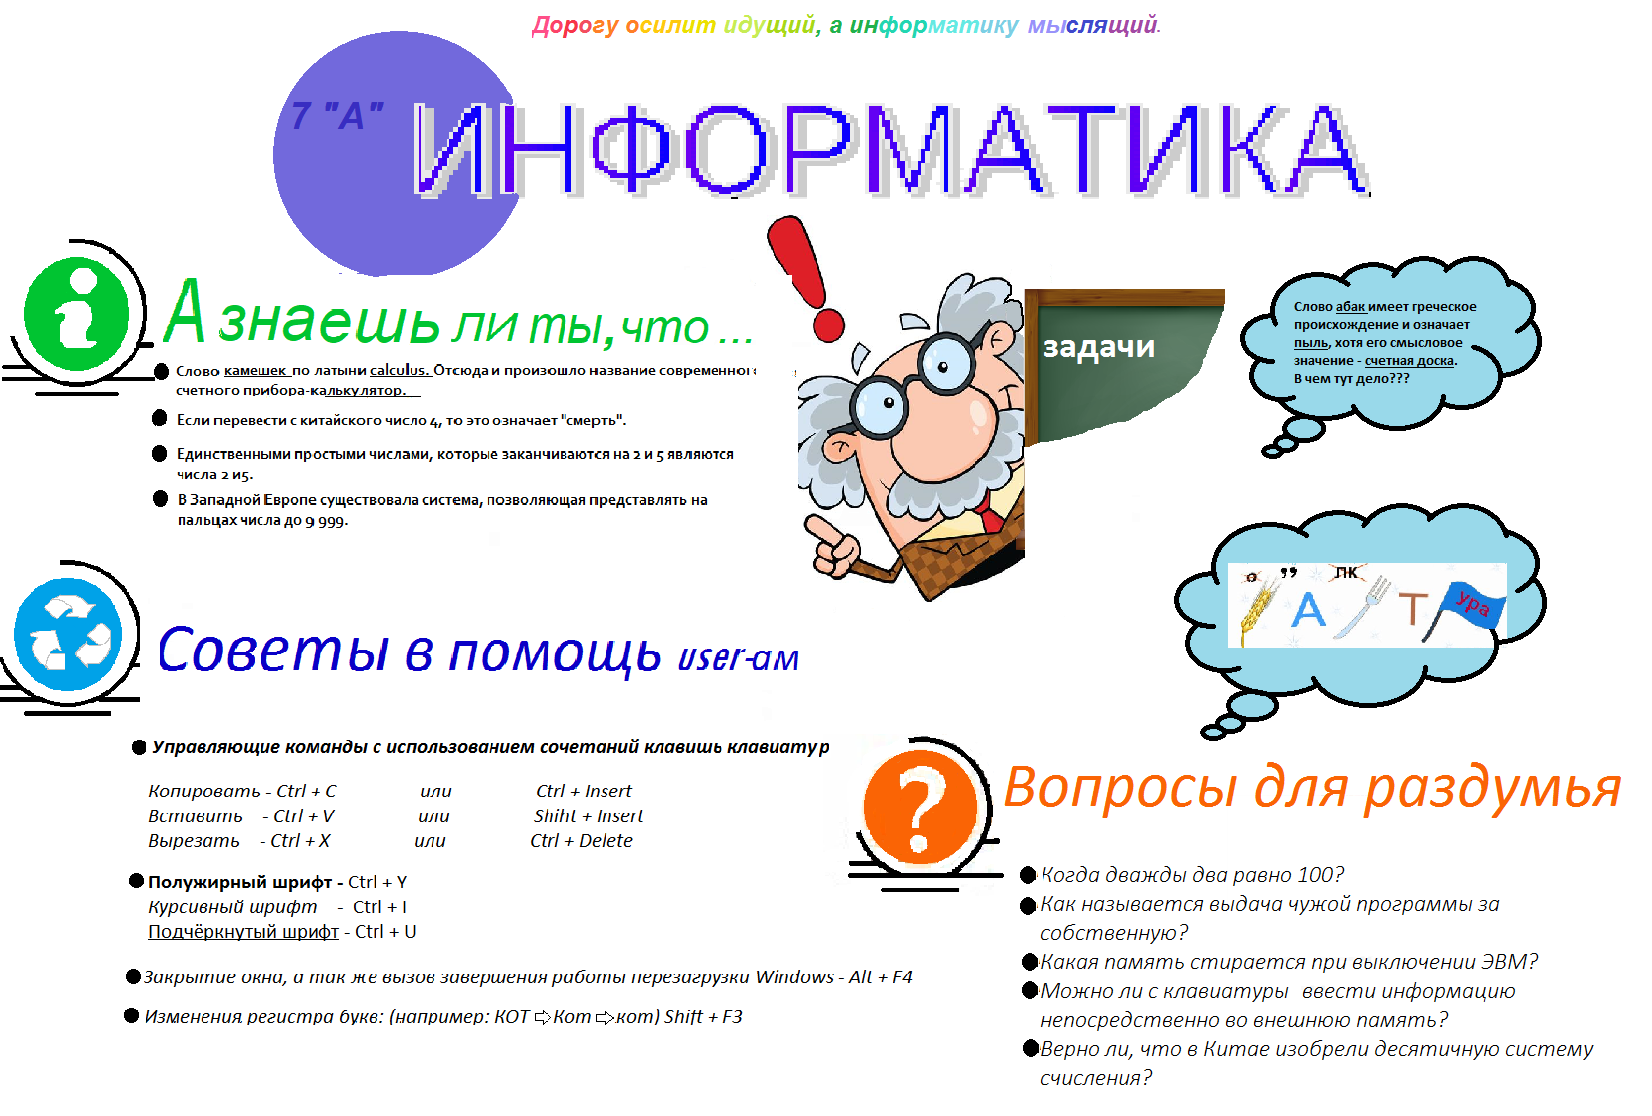 7 А (Герасева, Вакулина, Сухина, Михеева)